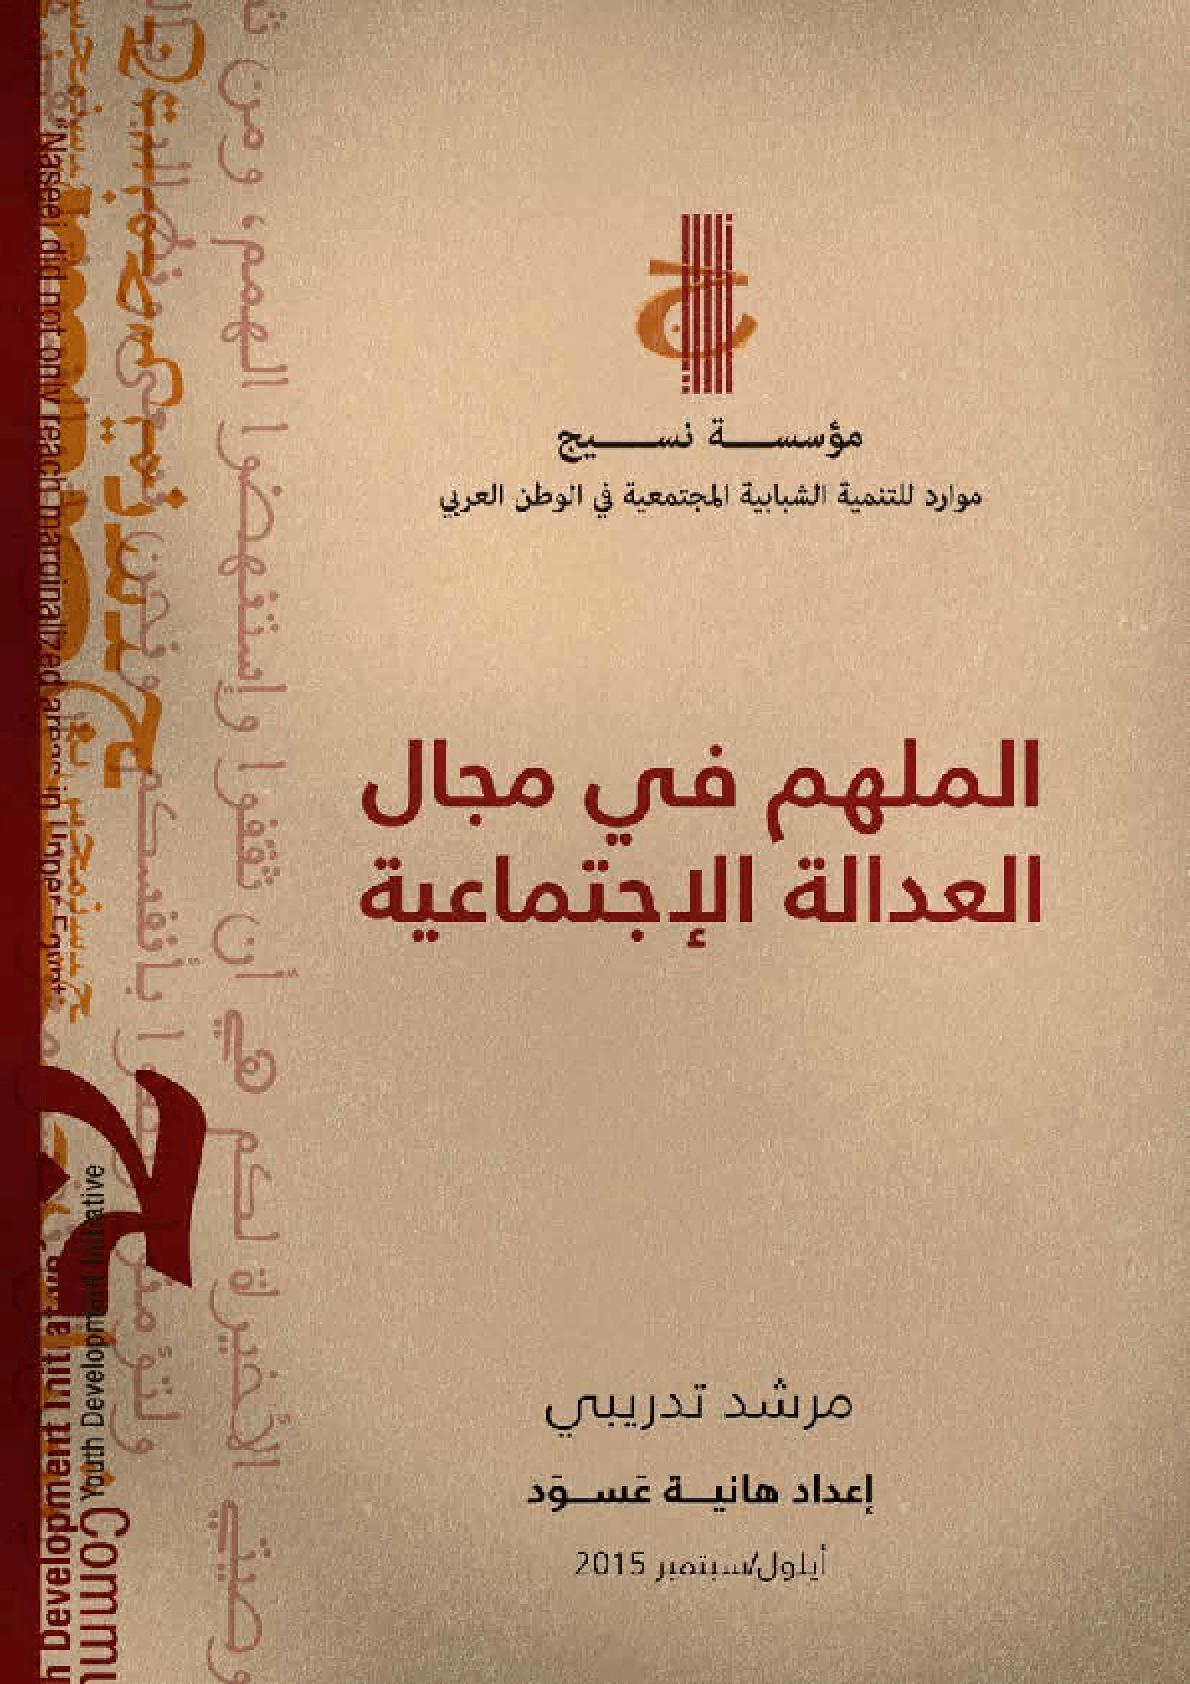 Al Mulhem in Social Justice Work